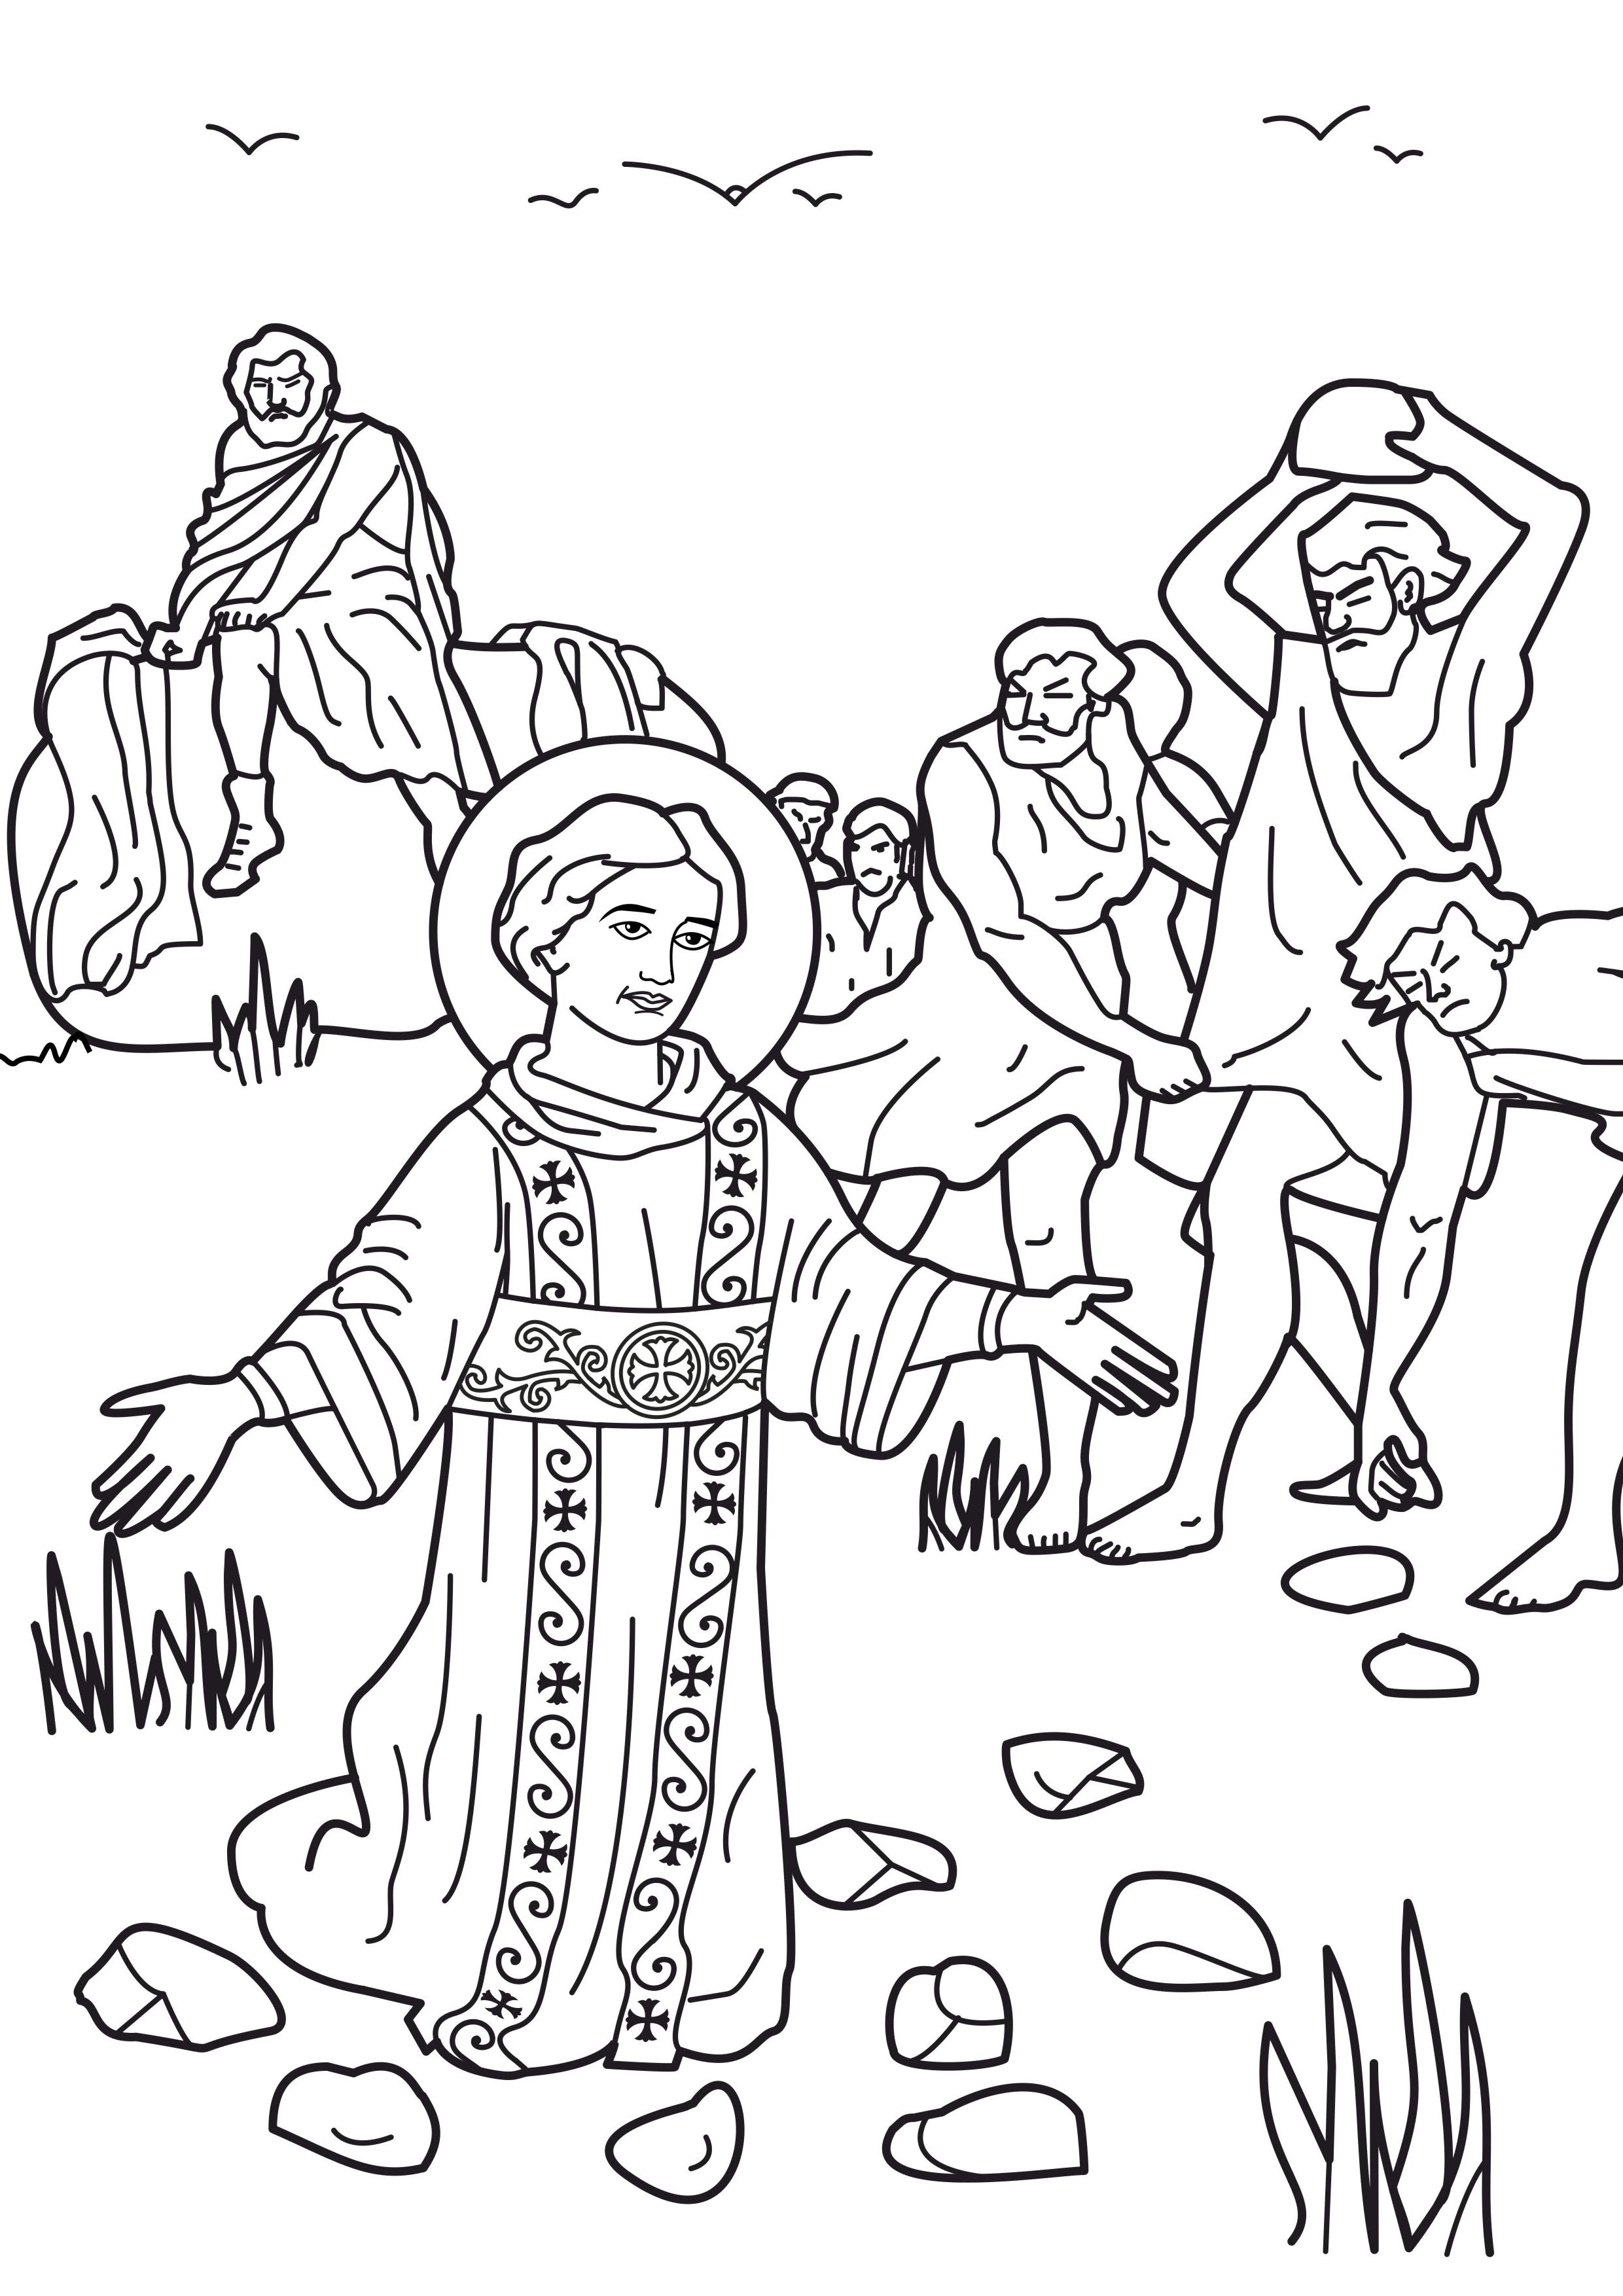 Familia Católica: Santos: Hermosas páginas para colorear